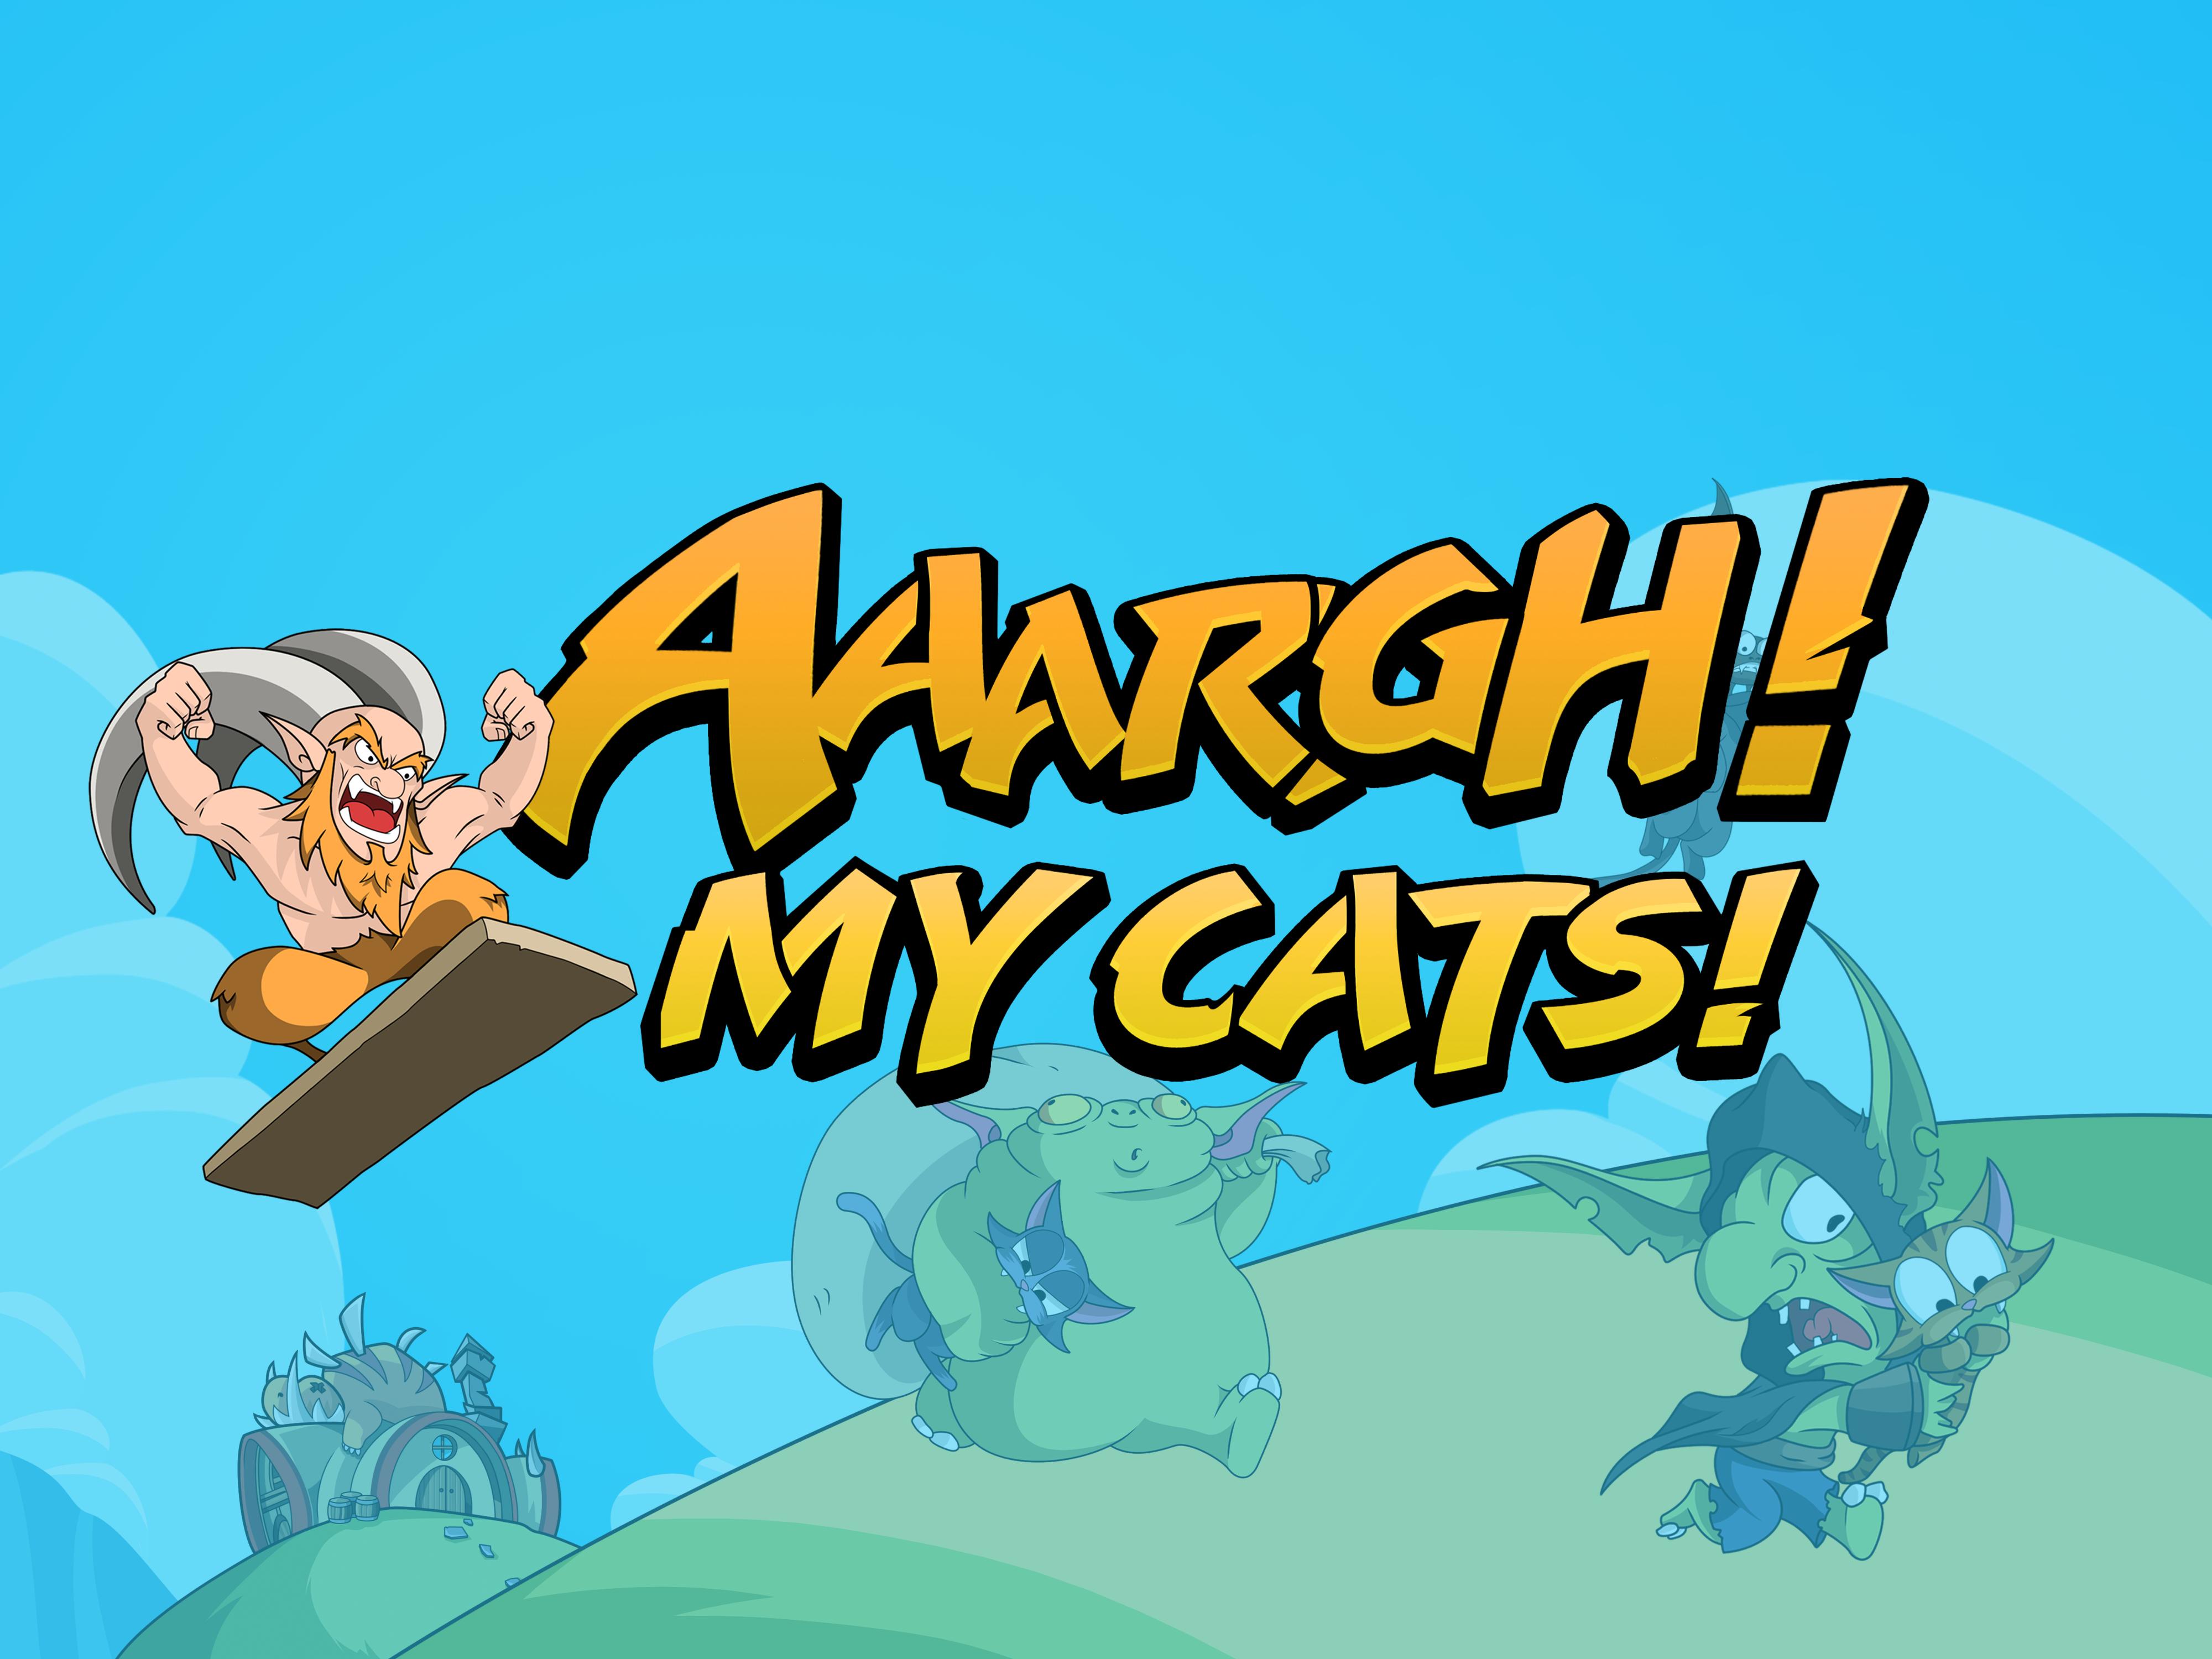 Aaargh! My Cats!